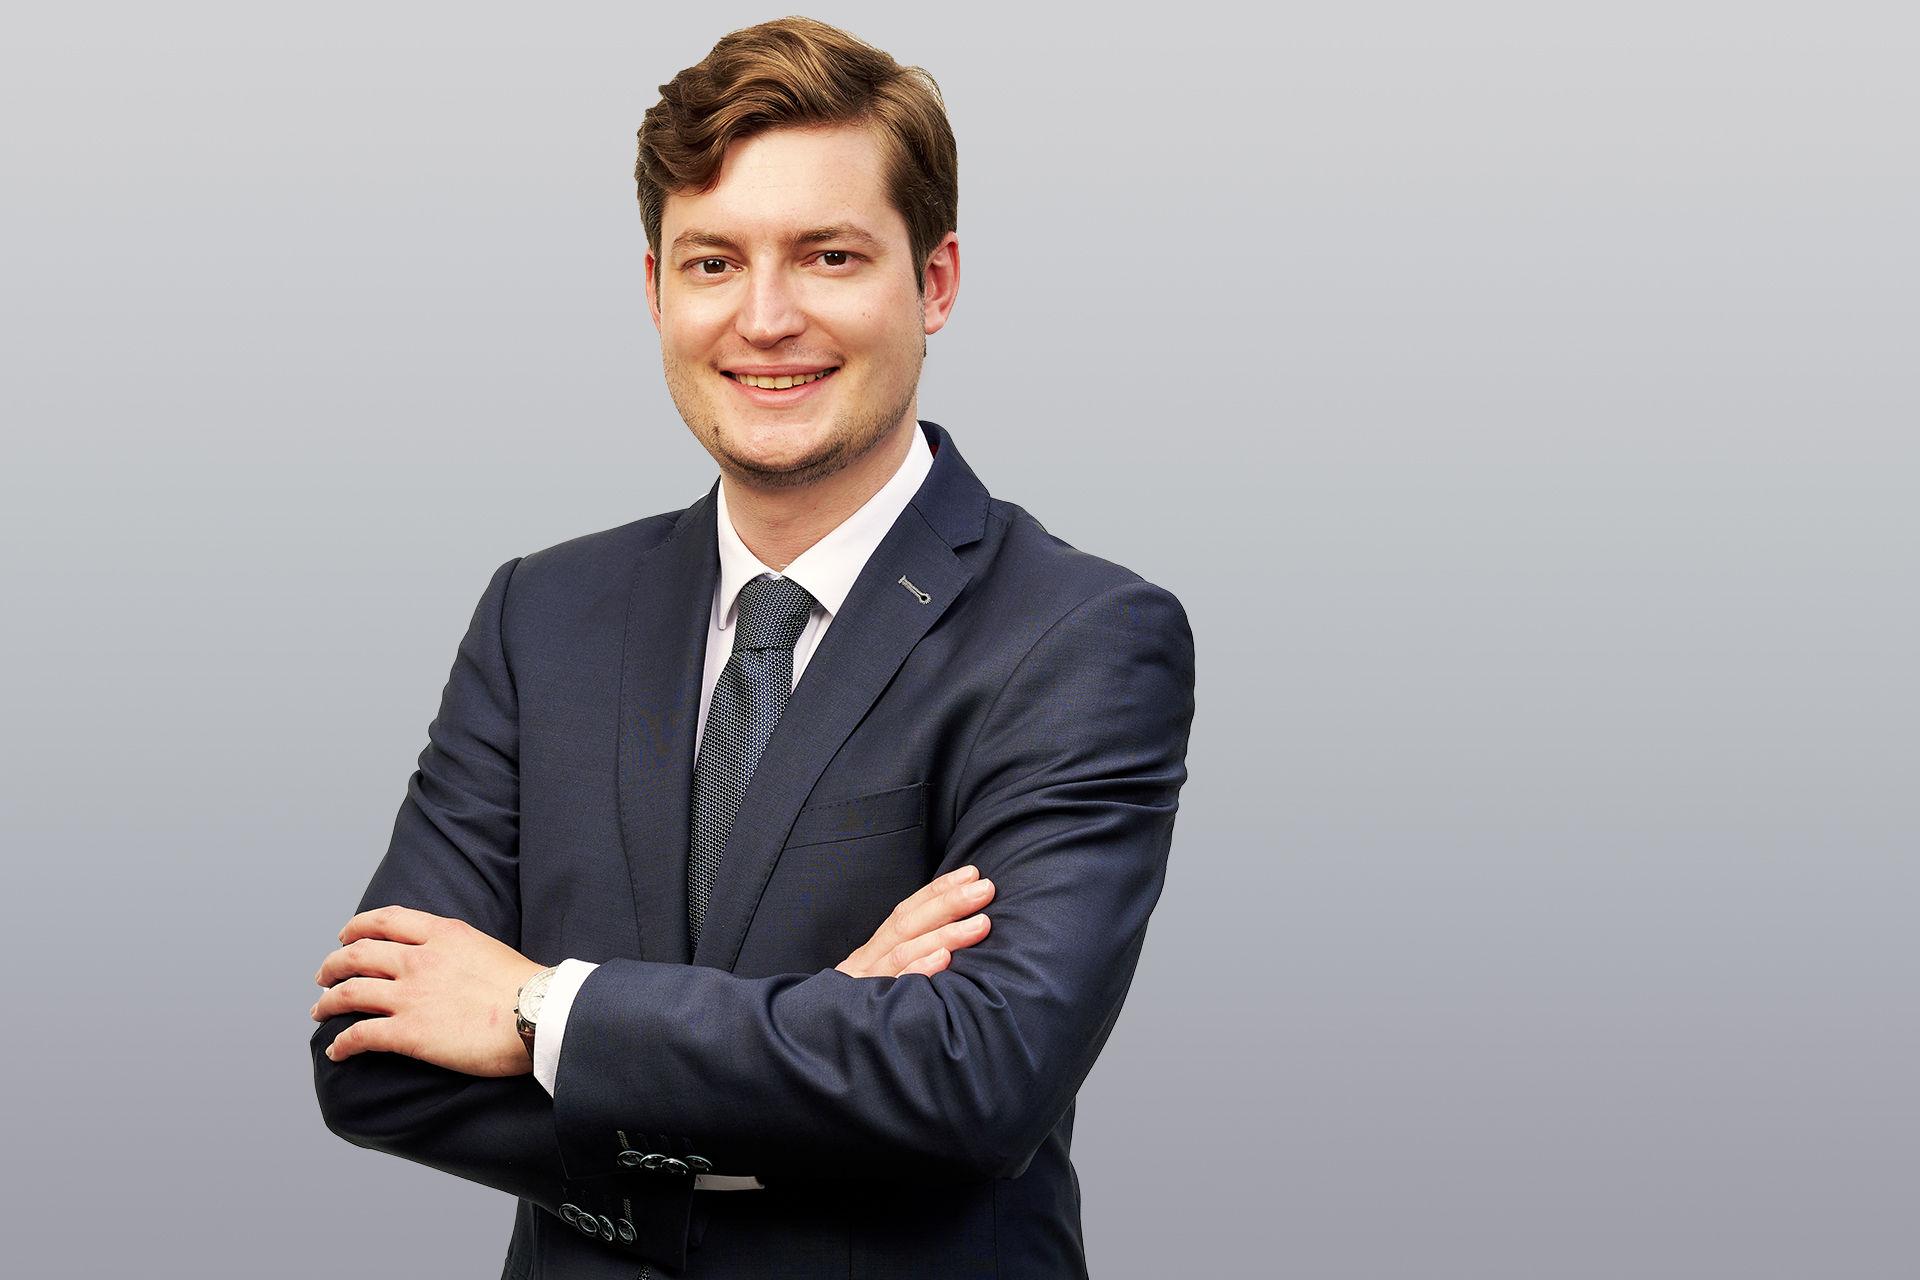 Rechtsanwalt Ernst Krinner